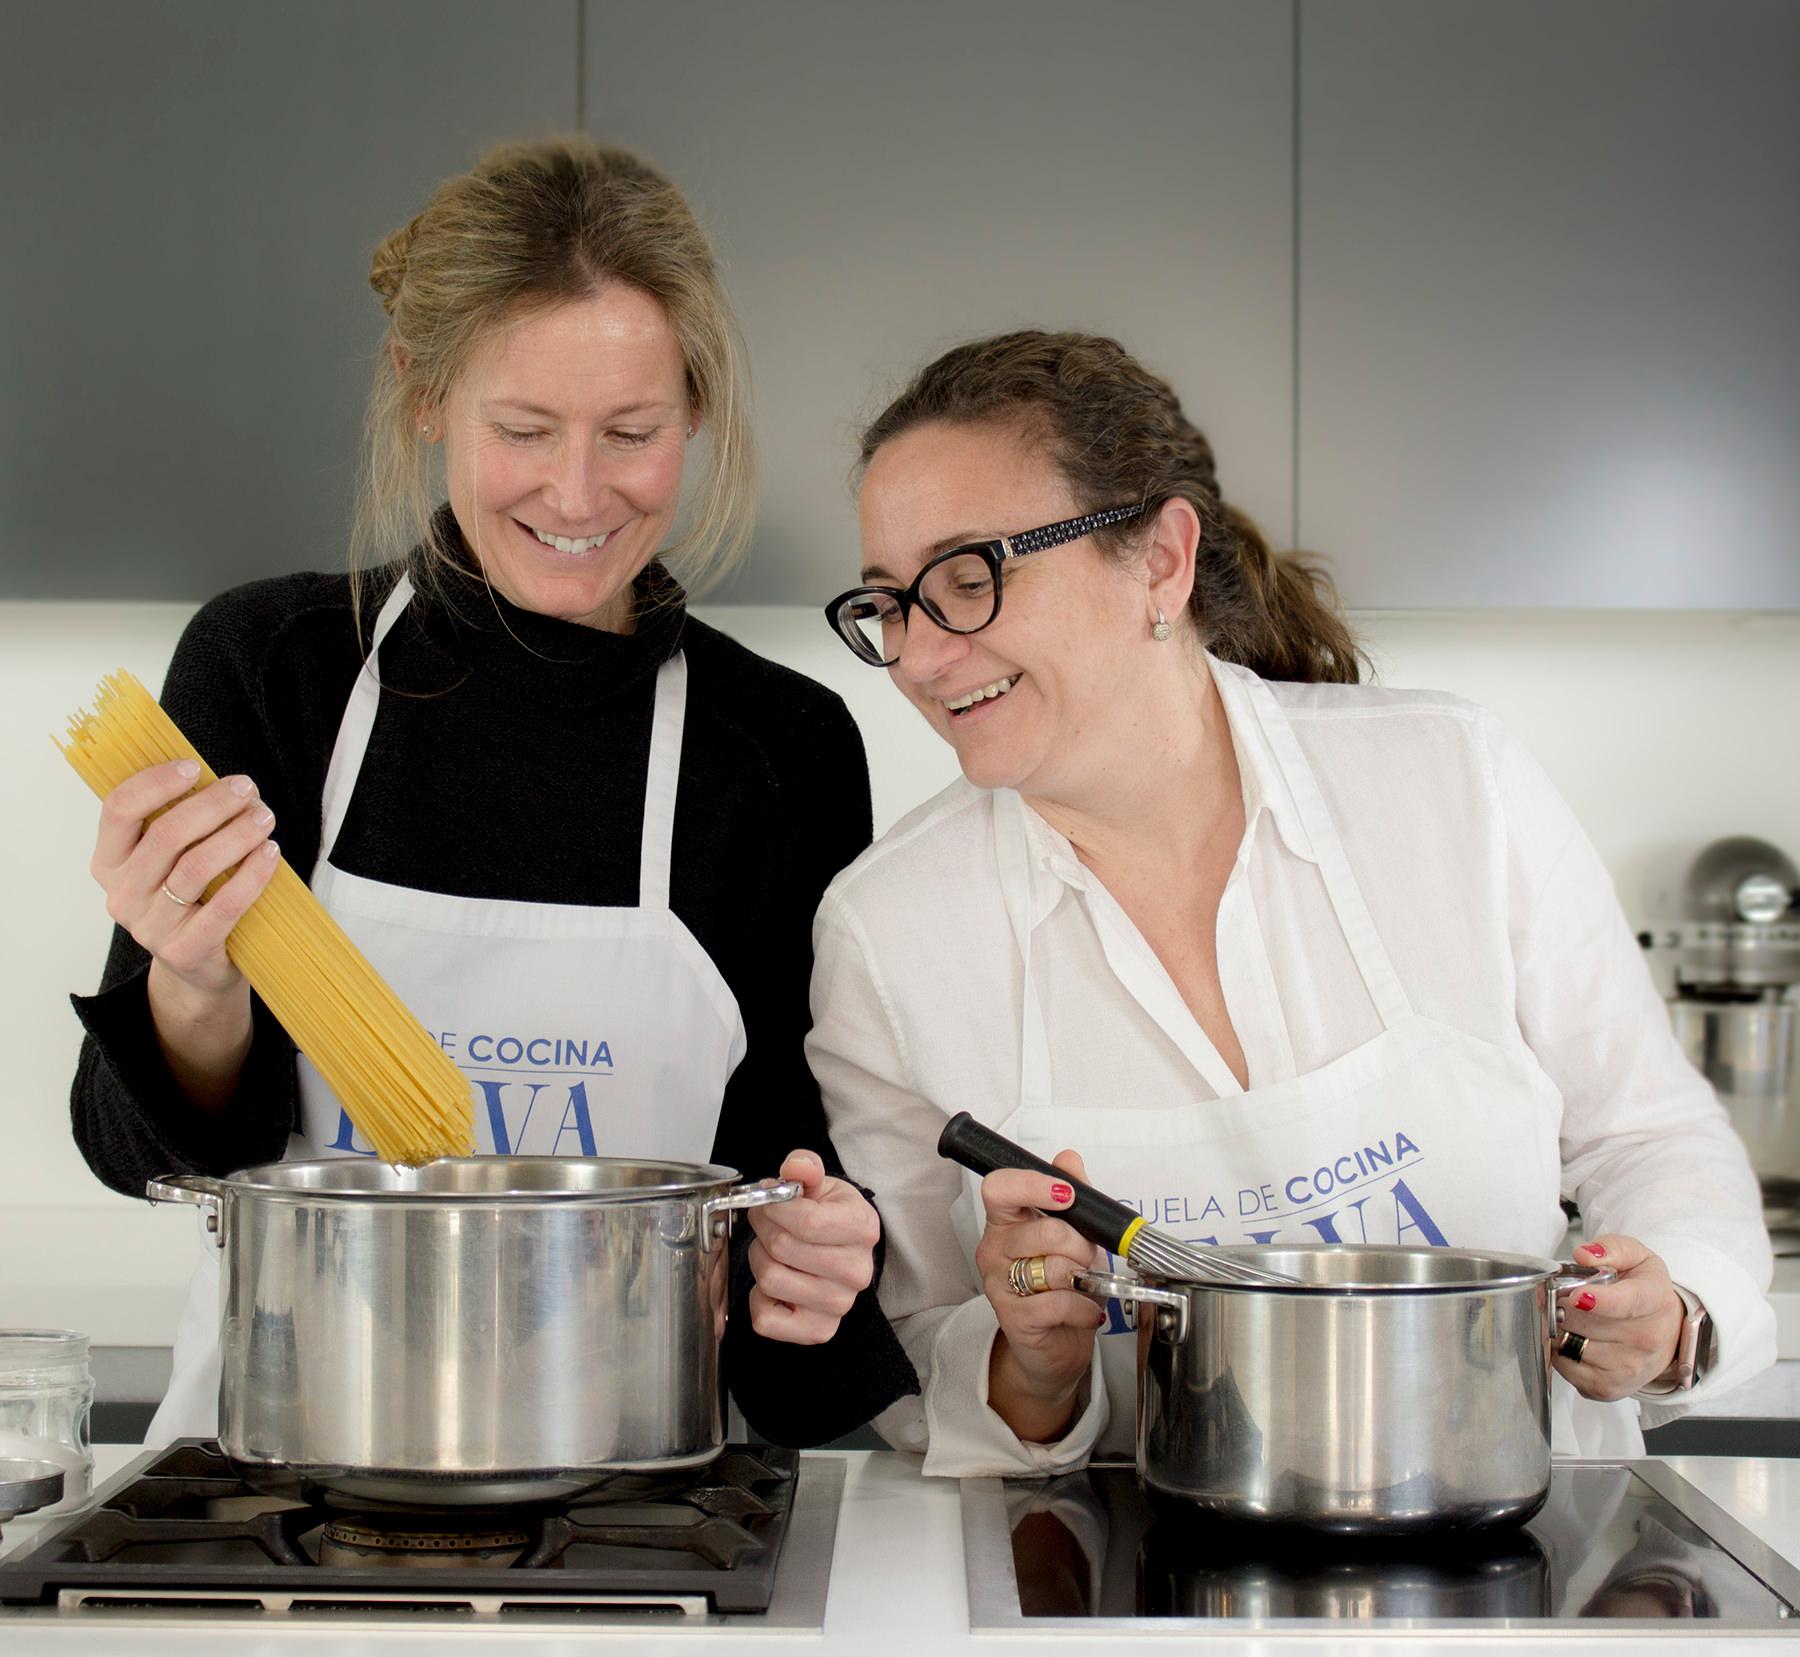 Clases de cocina a medida escuela de cocina telva - Escuela de cocina ...